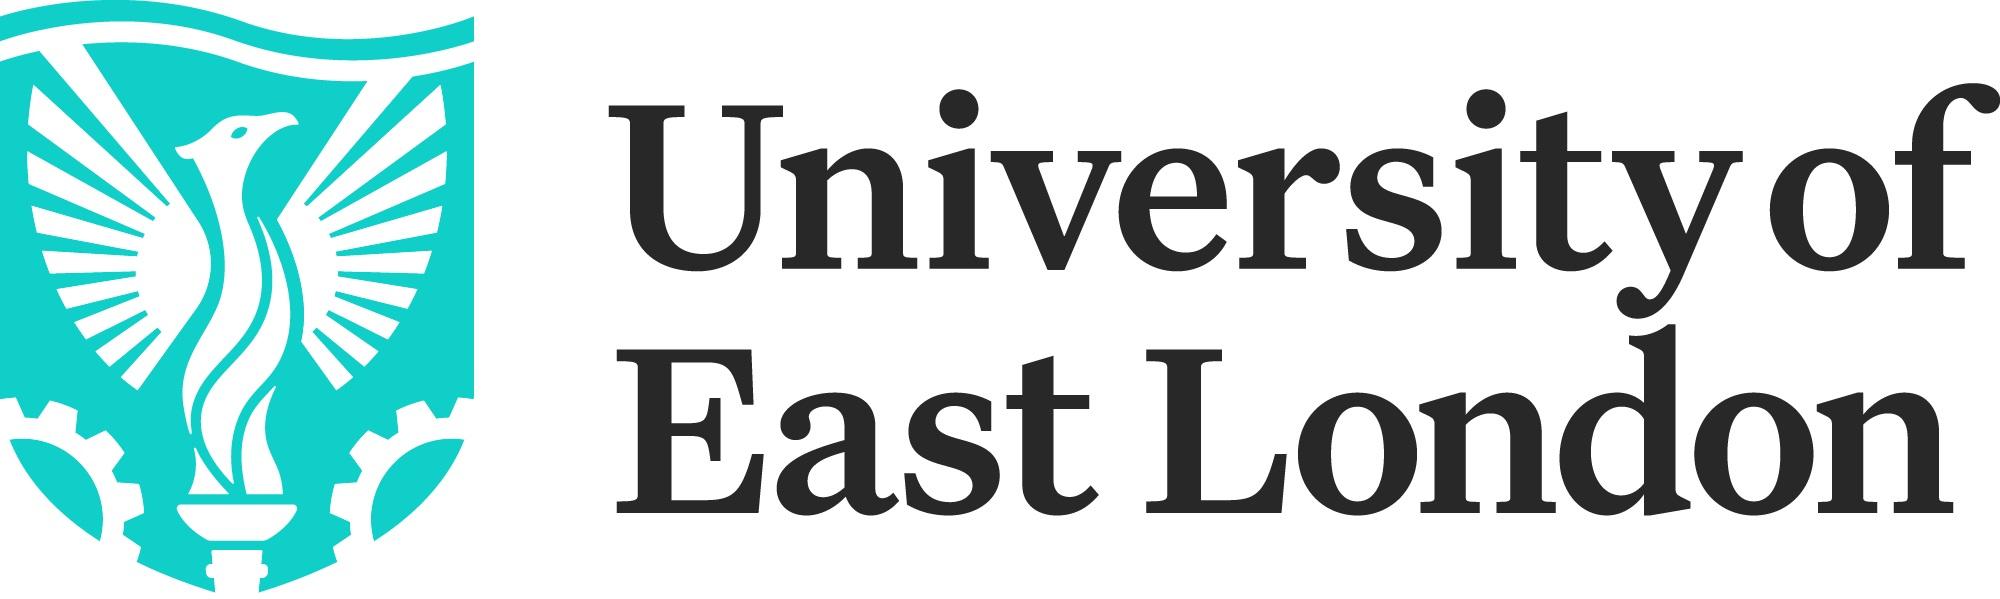 University of East London CasaEducation